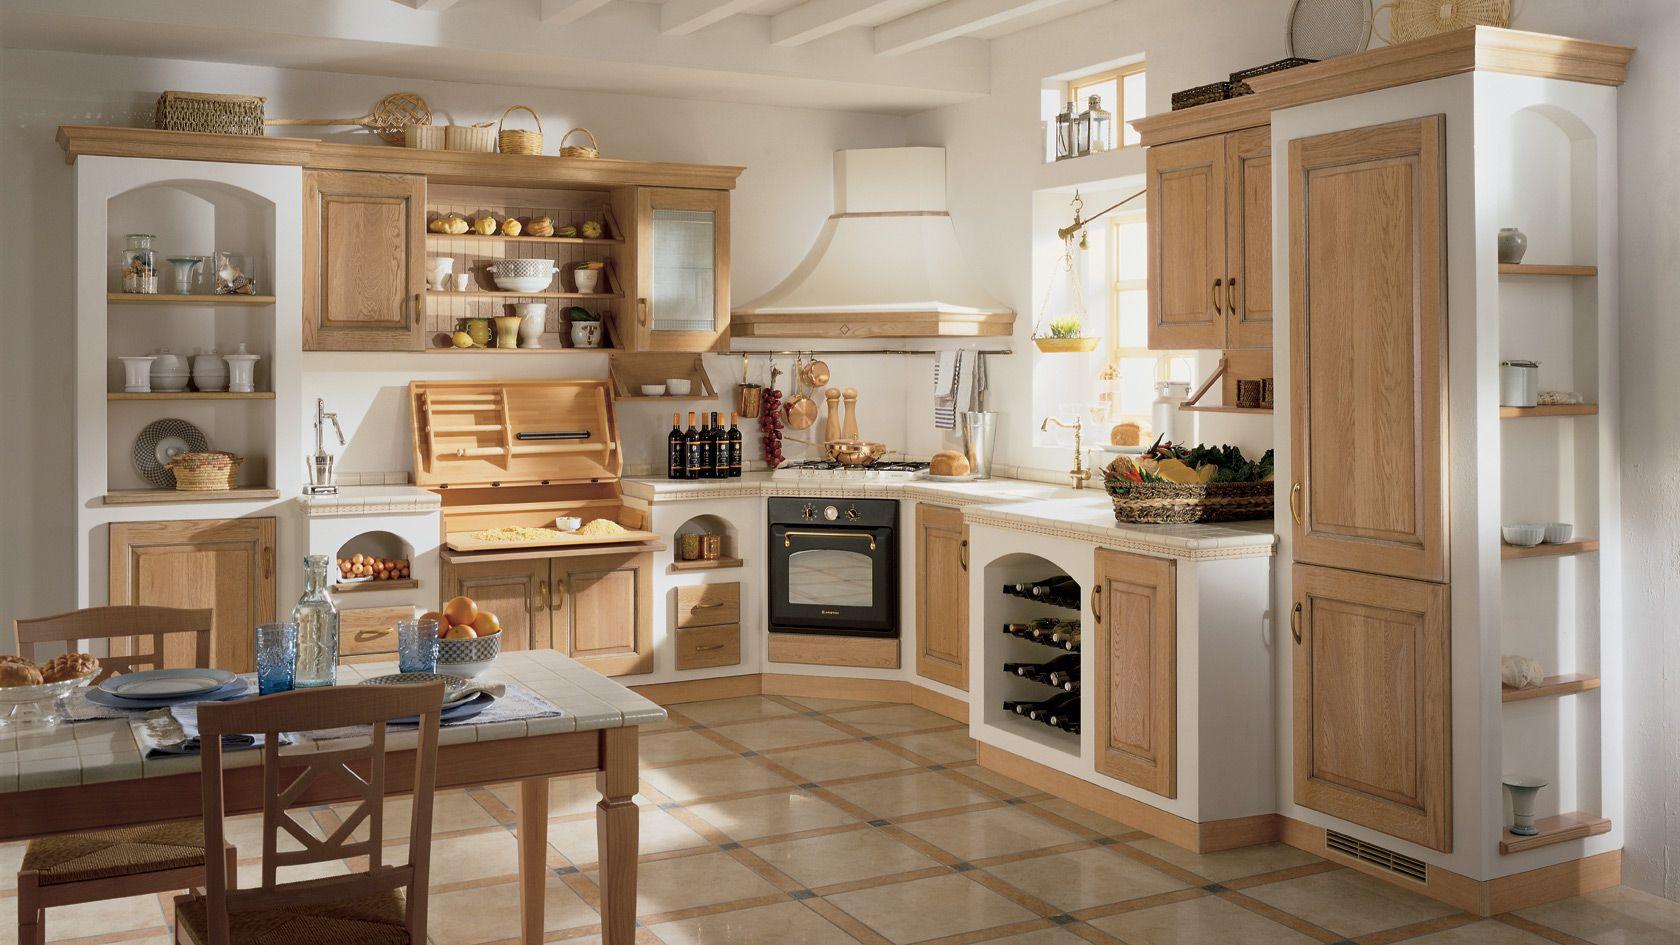 cucina belvedere scavolini | kitchen | pinterest | form, madeira, Hause ideen